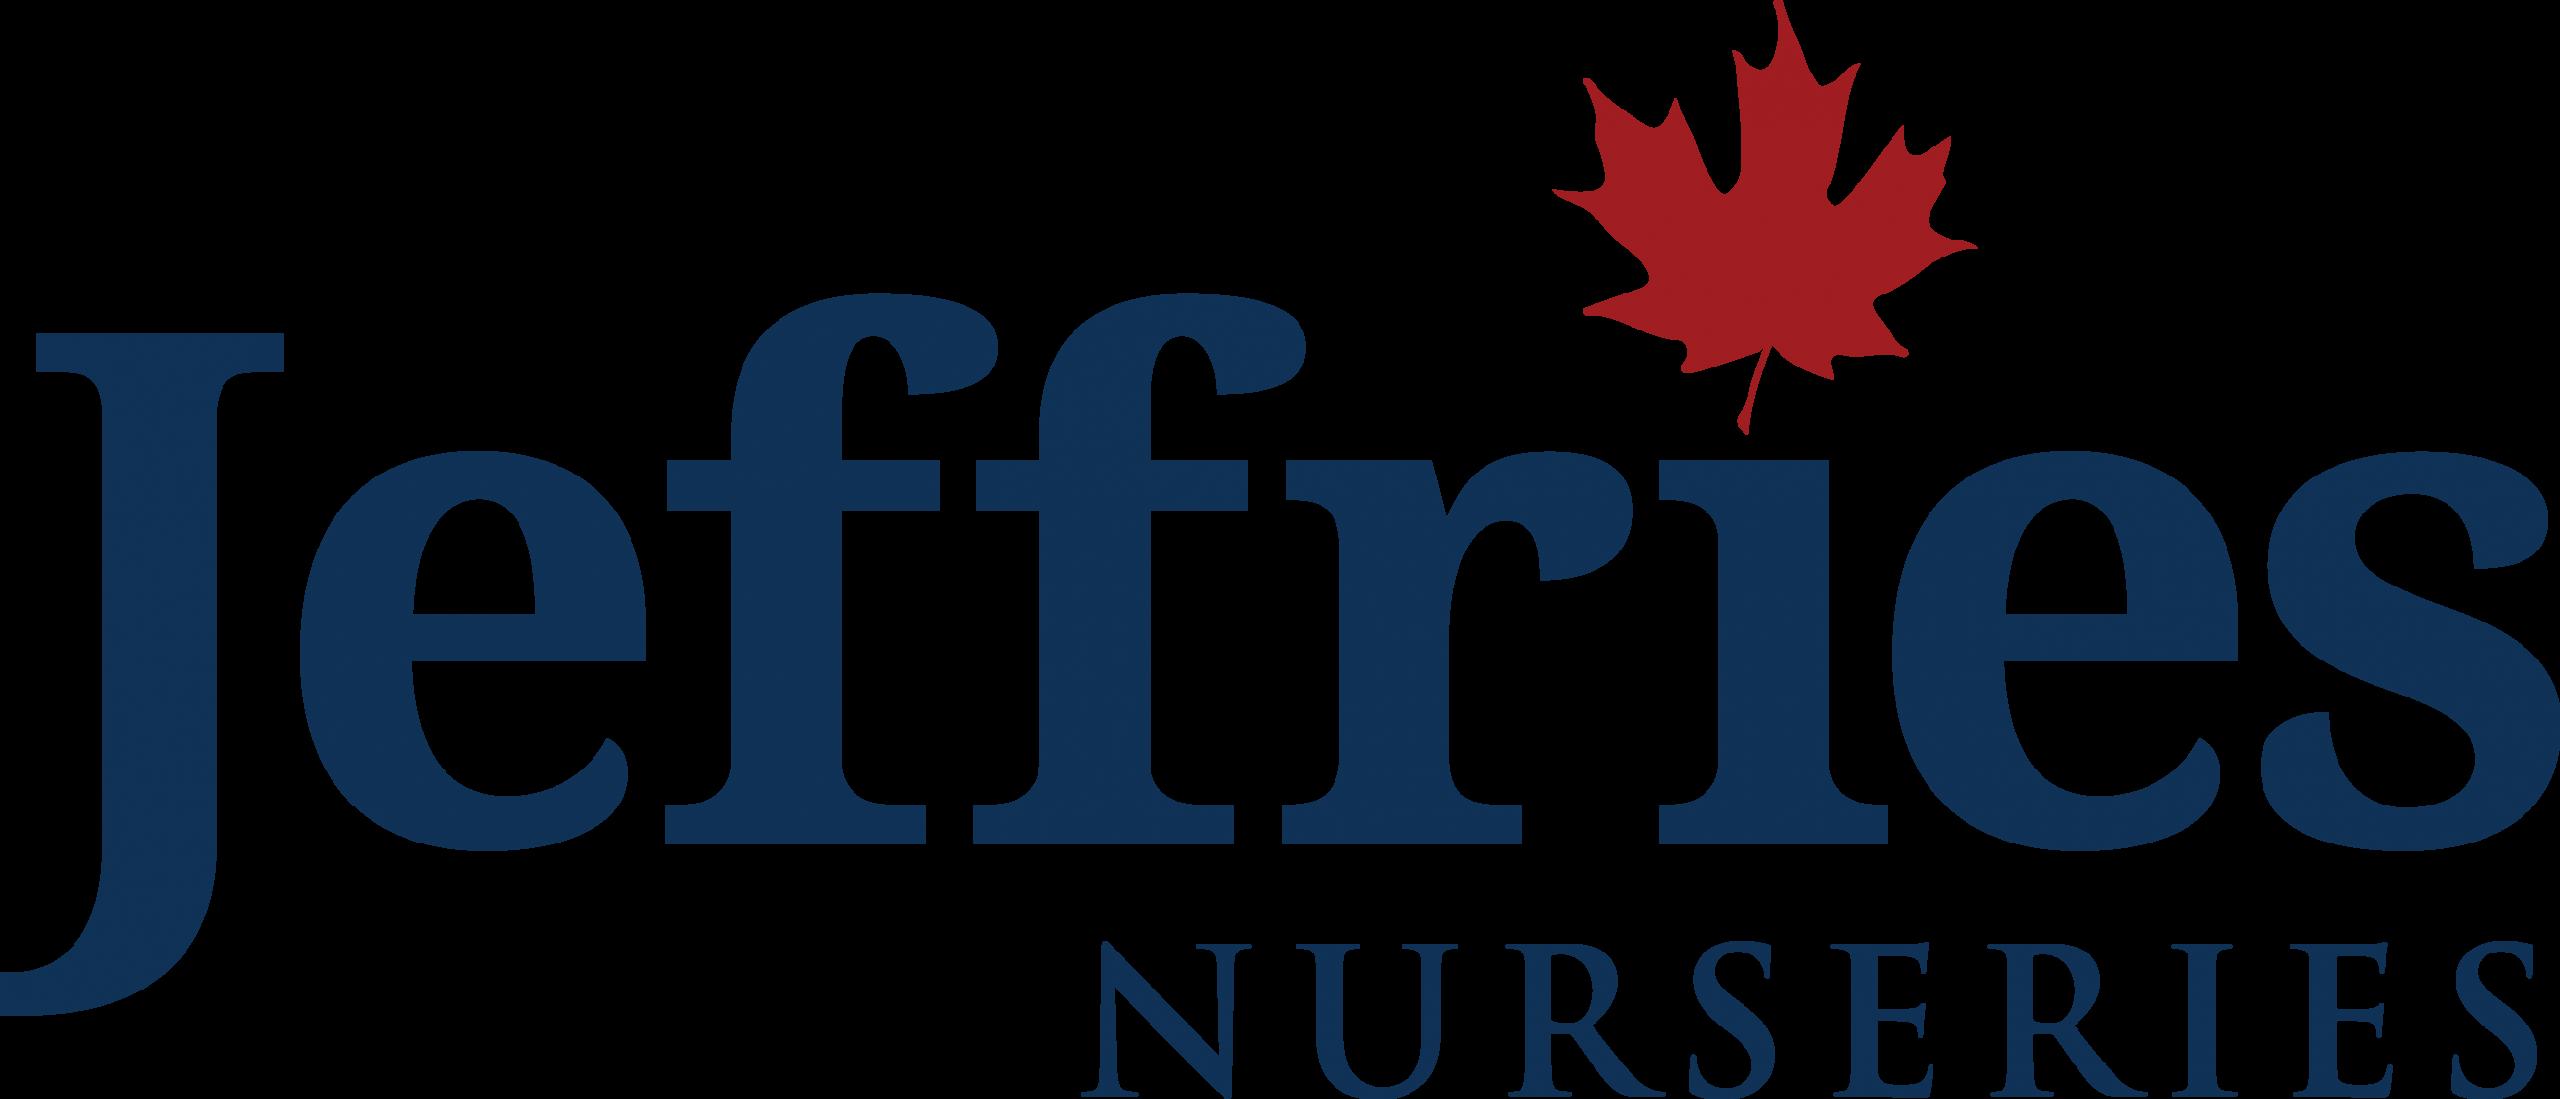 Jeffries Nurseries